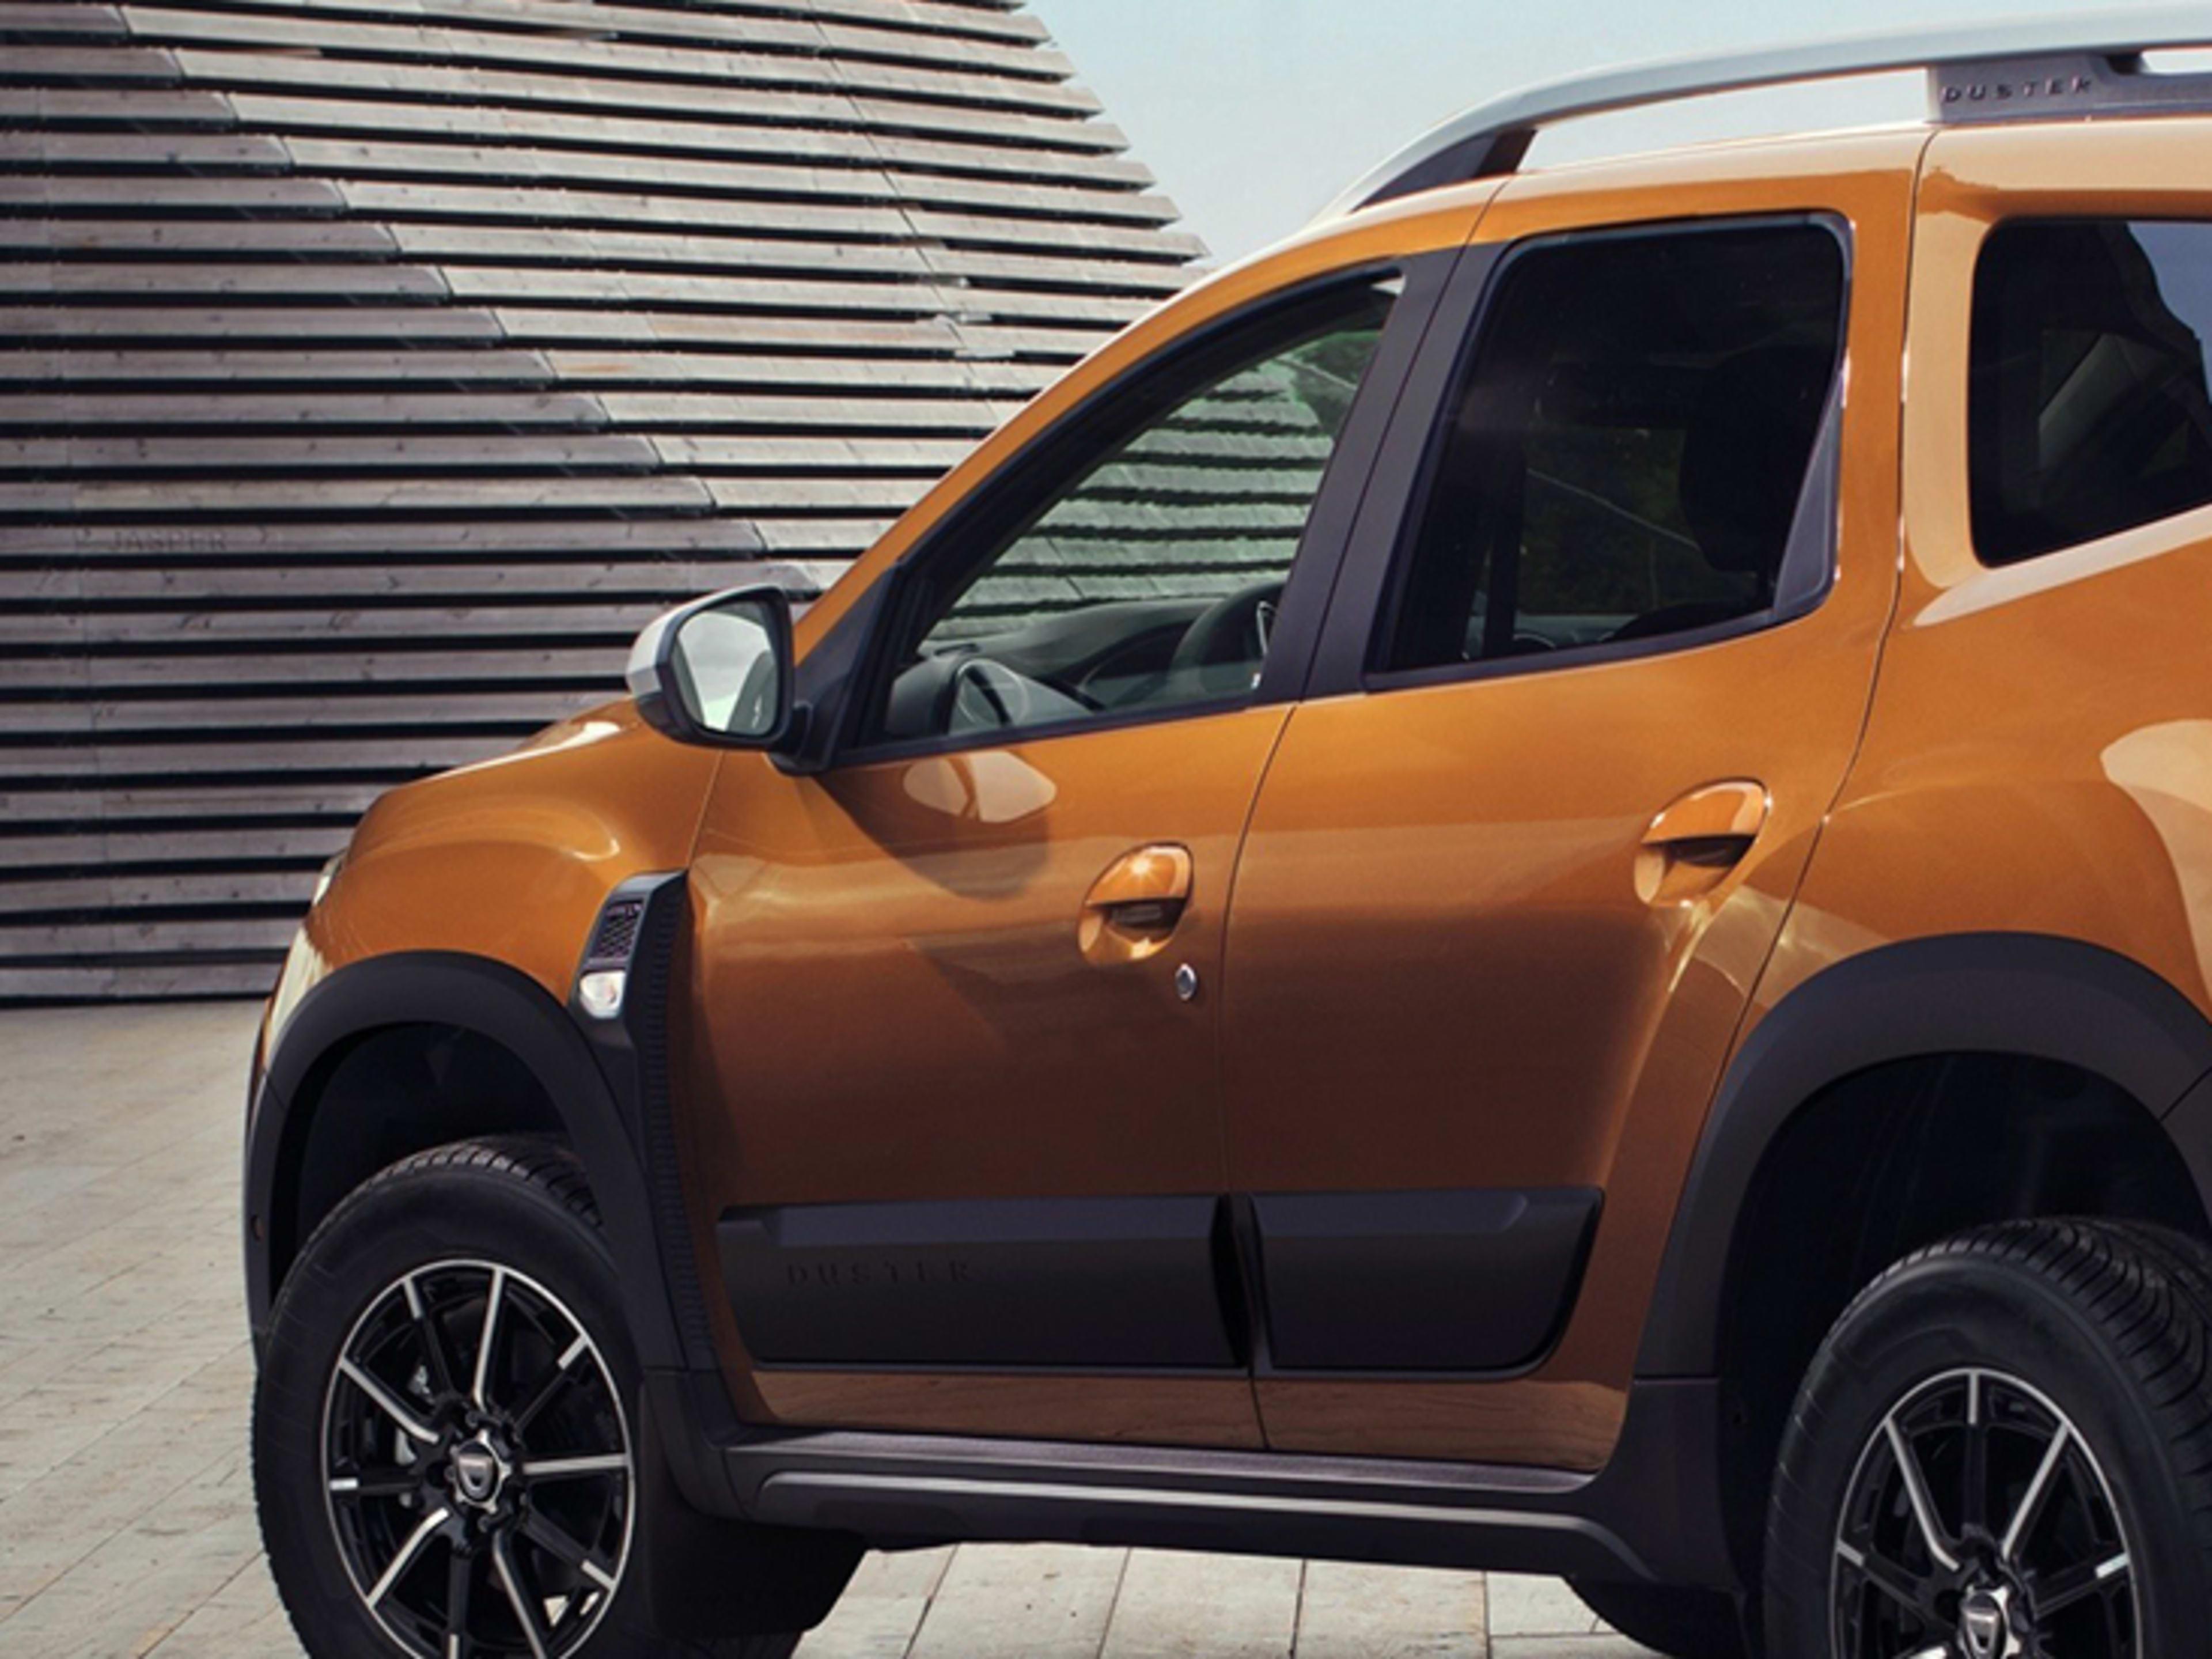 Used Cars | Cavan, Drogheda, Dundalk | Blackstone Motors